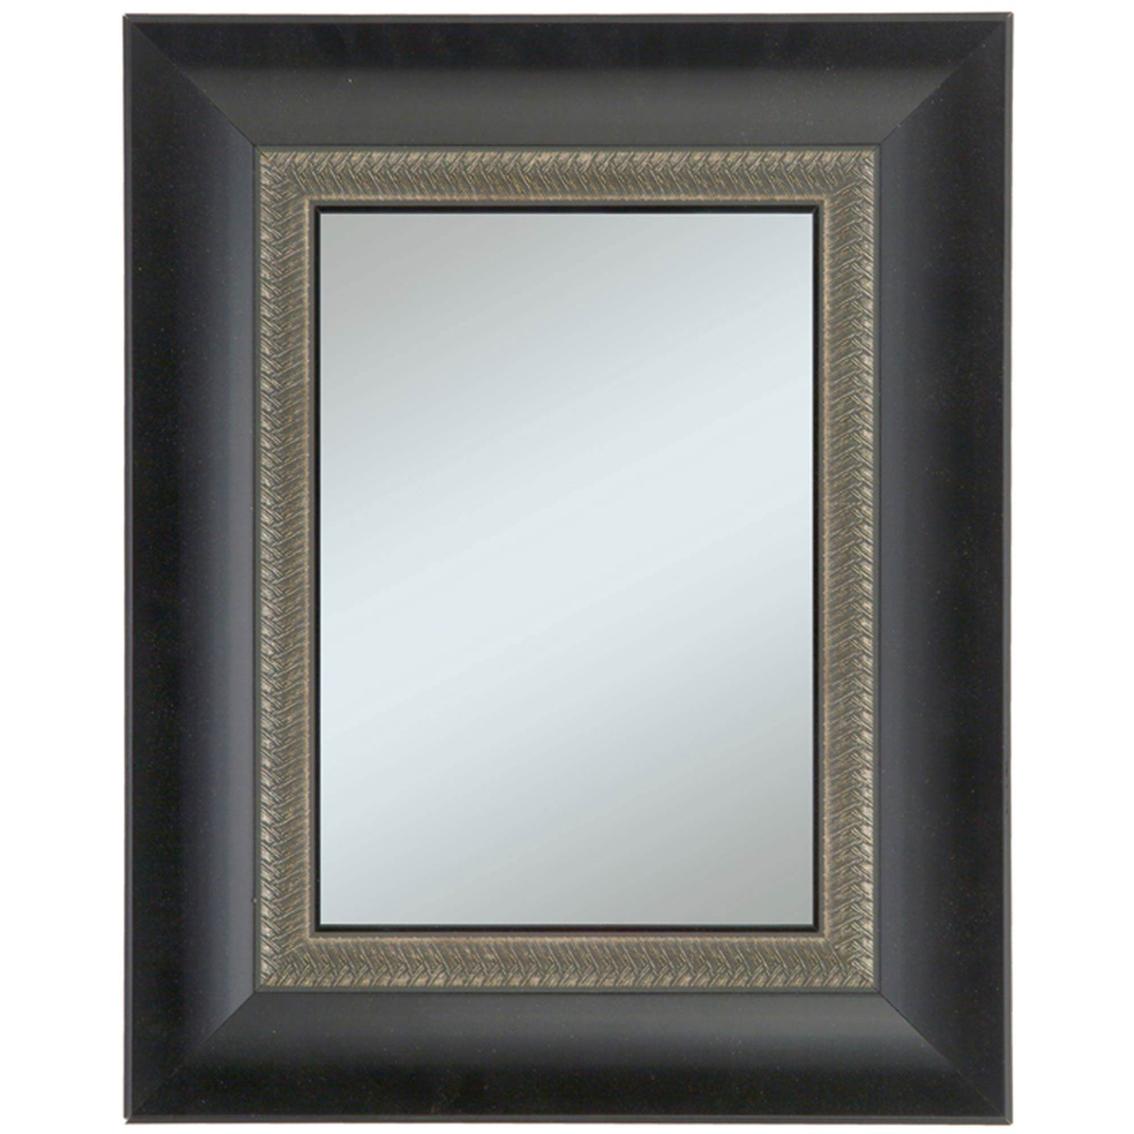 alpine art mirror black with decorative leaf edge framed wall mirror mirrors home. Black Bedroom Furniture Sets. Home Design Ideas